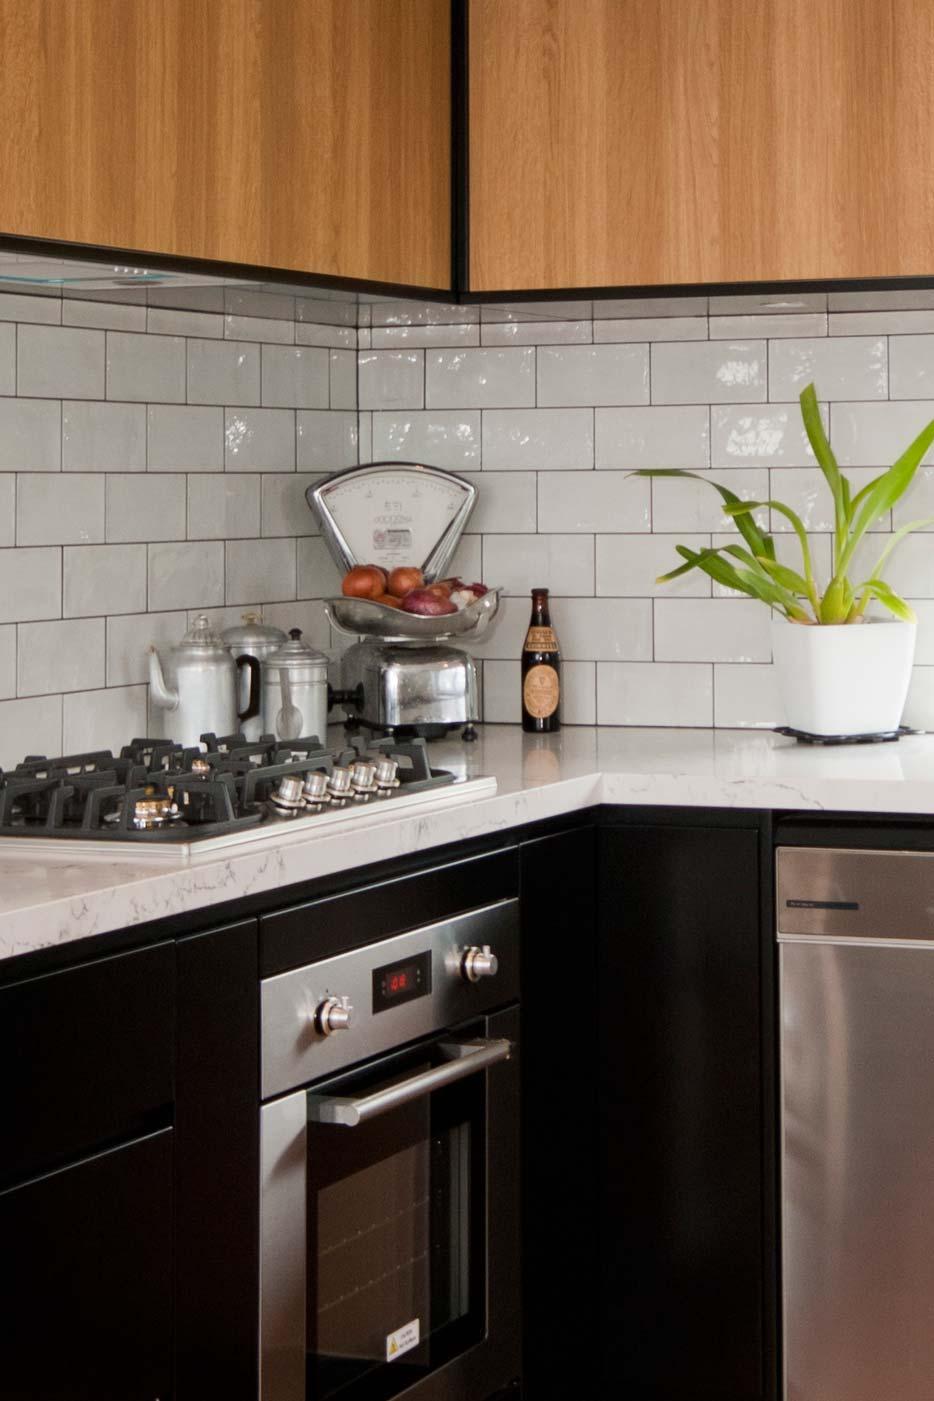 Caesarstone White Attica Dulux Domino Black Kitchen Design Polyurethane Cabinets Industrial 2